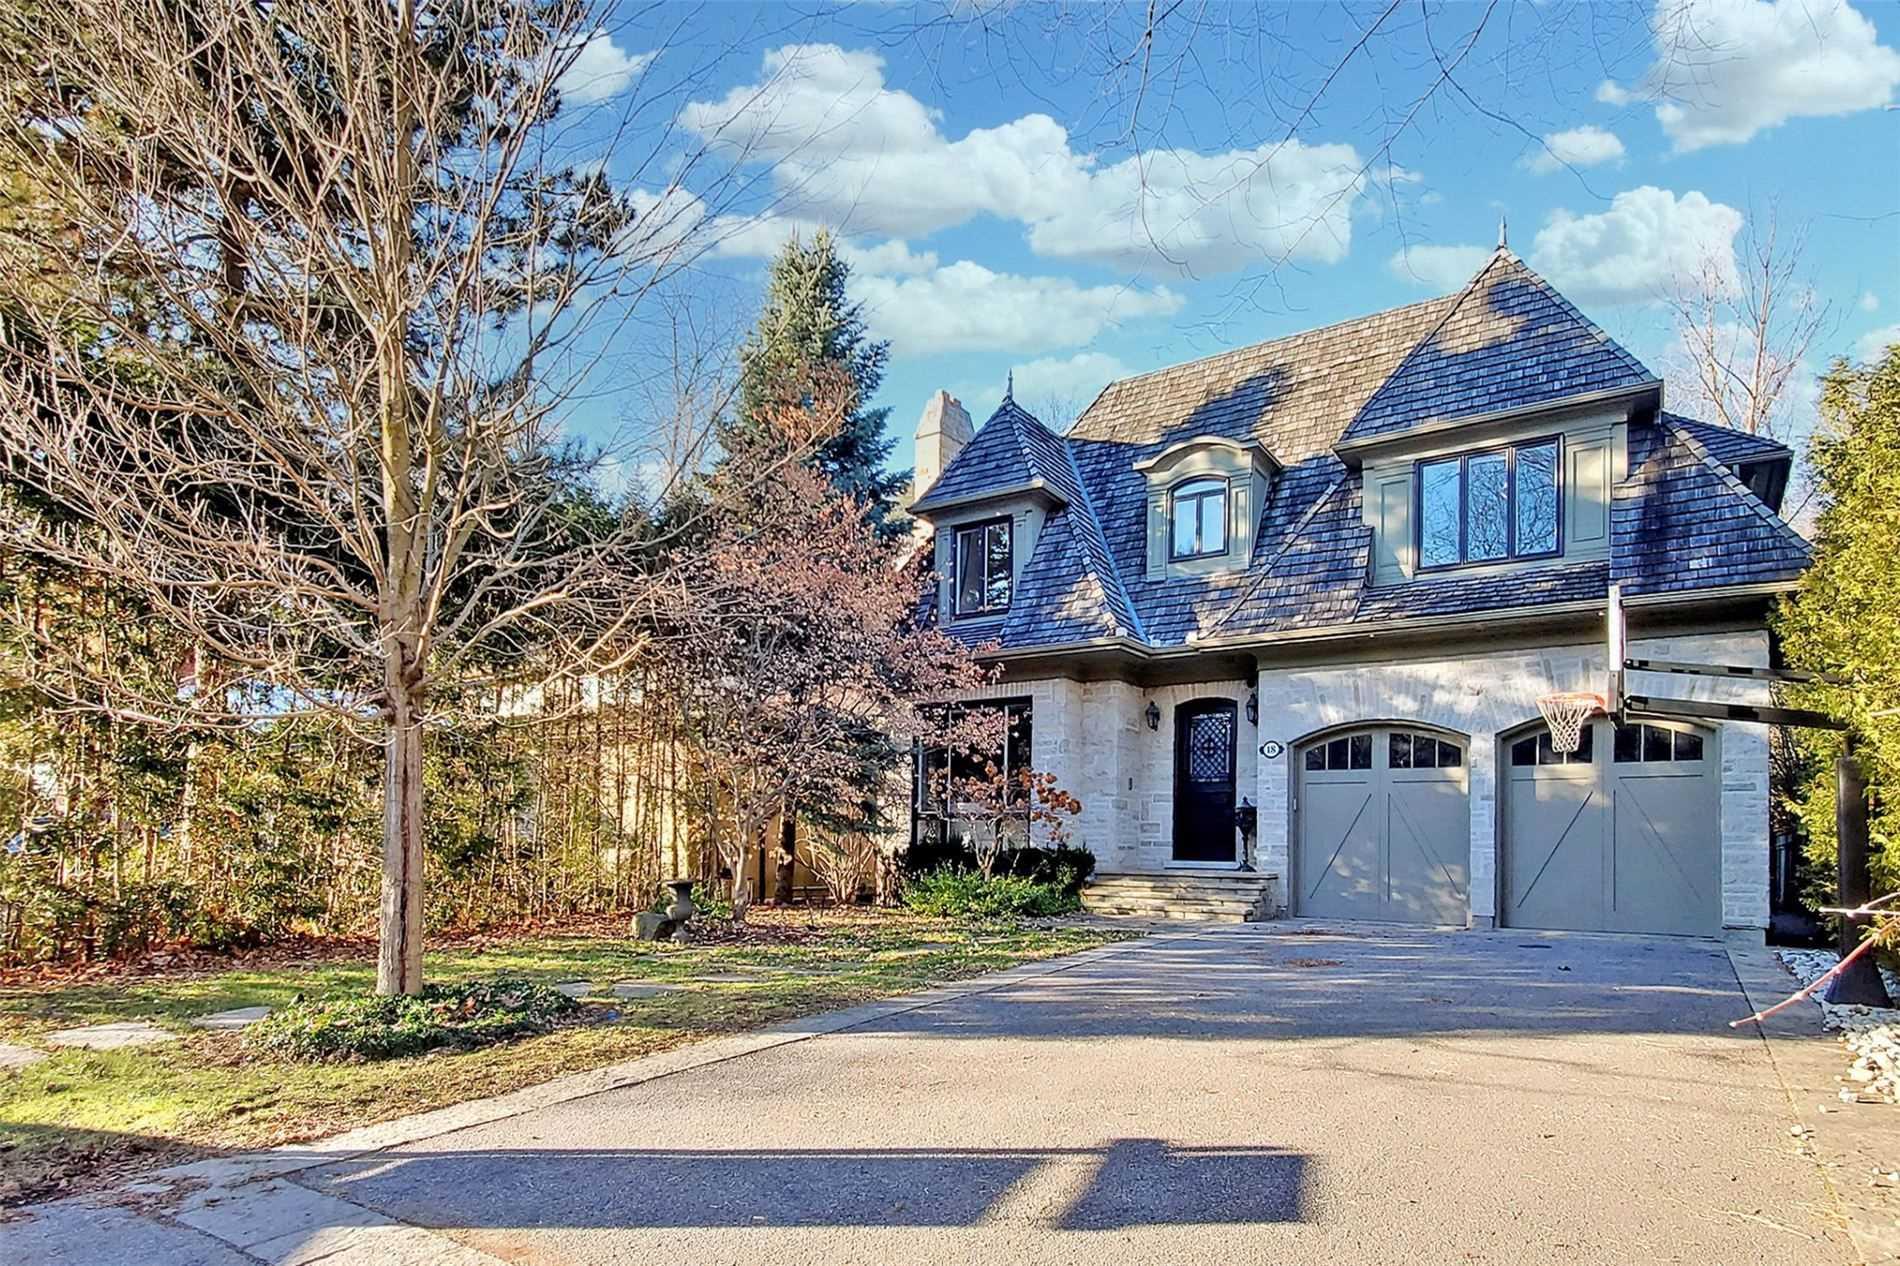 18 Brookfield Rd - C4943530 - $6,280,000